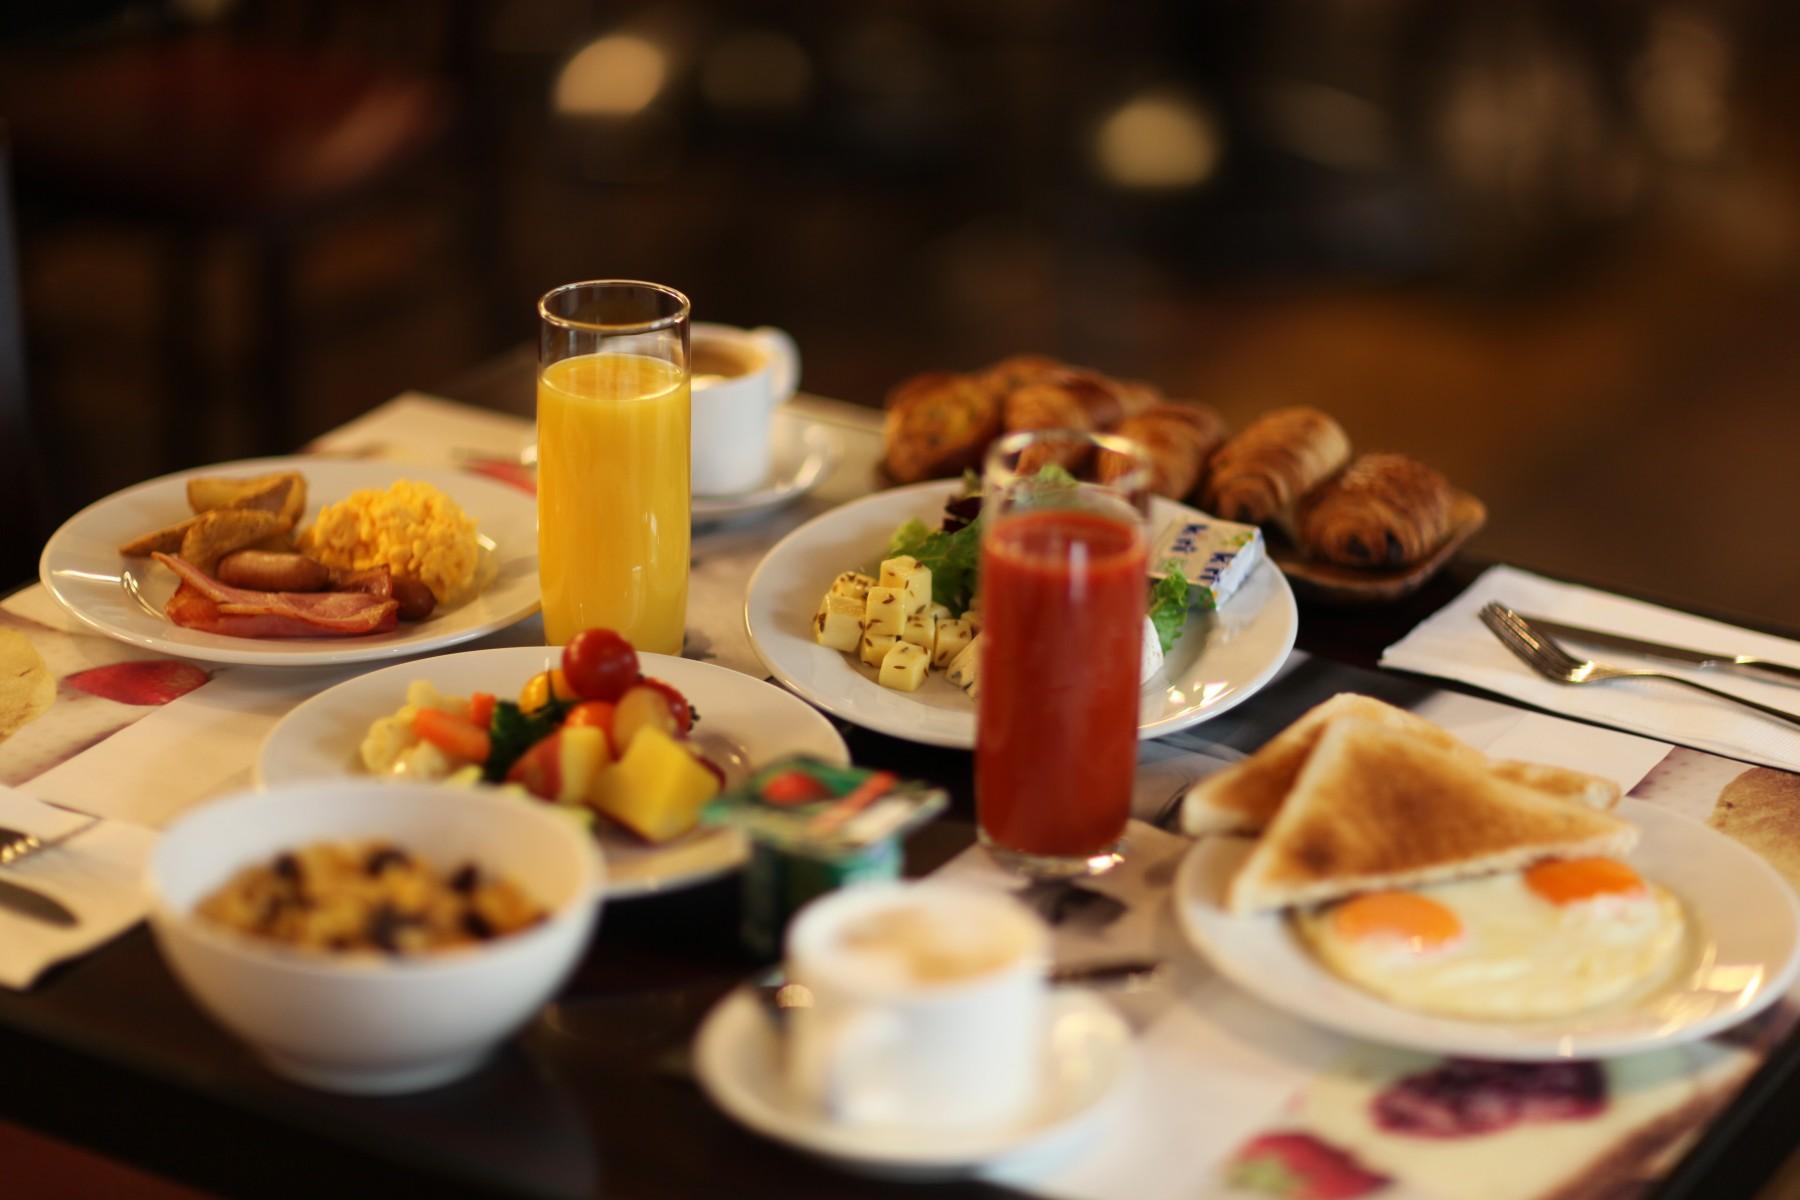 breakfast-set-menu-for-%c2%a5-1800